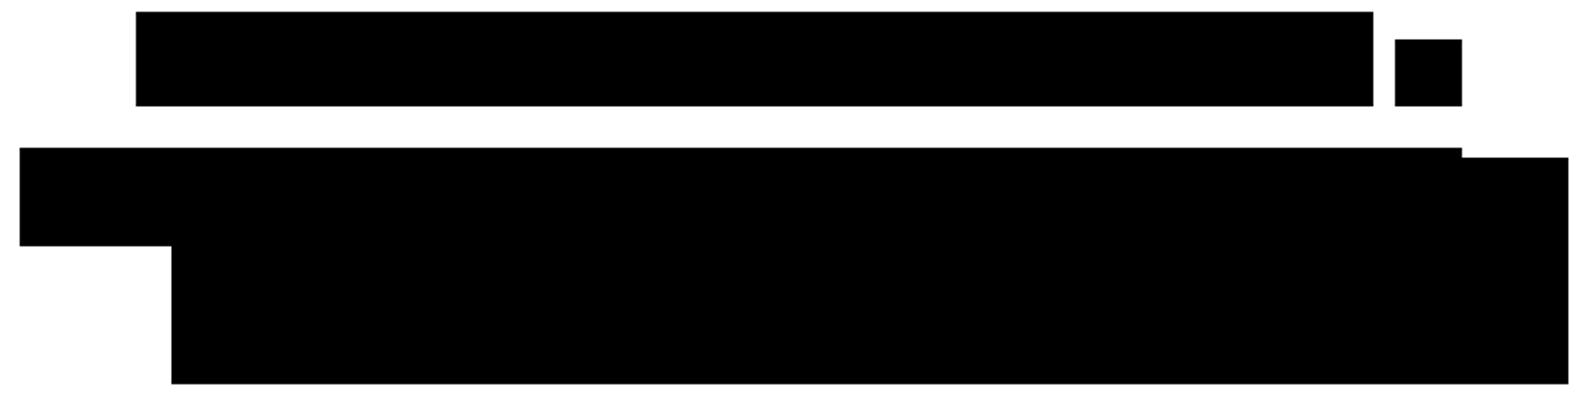 APPI JAZZY SPORT 2020 が開催される2020.1.18の専用プラン!限定販売再開!